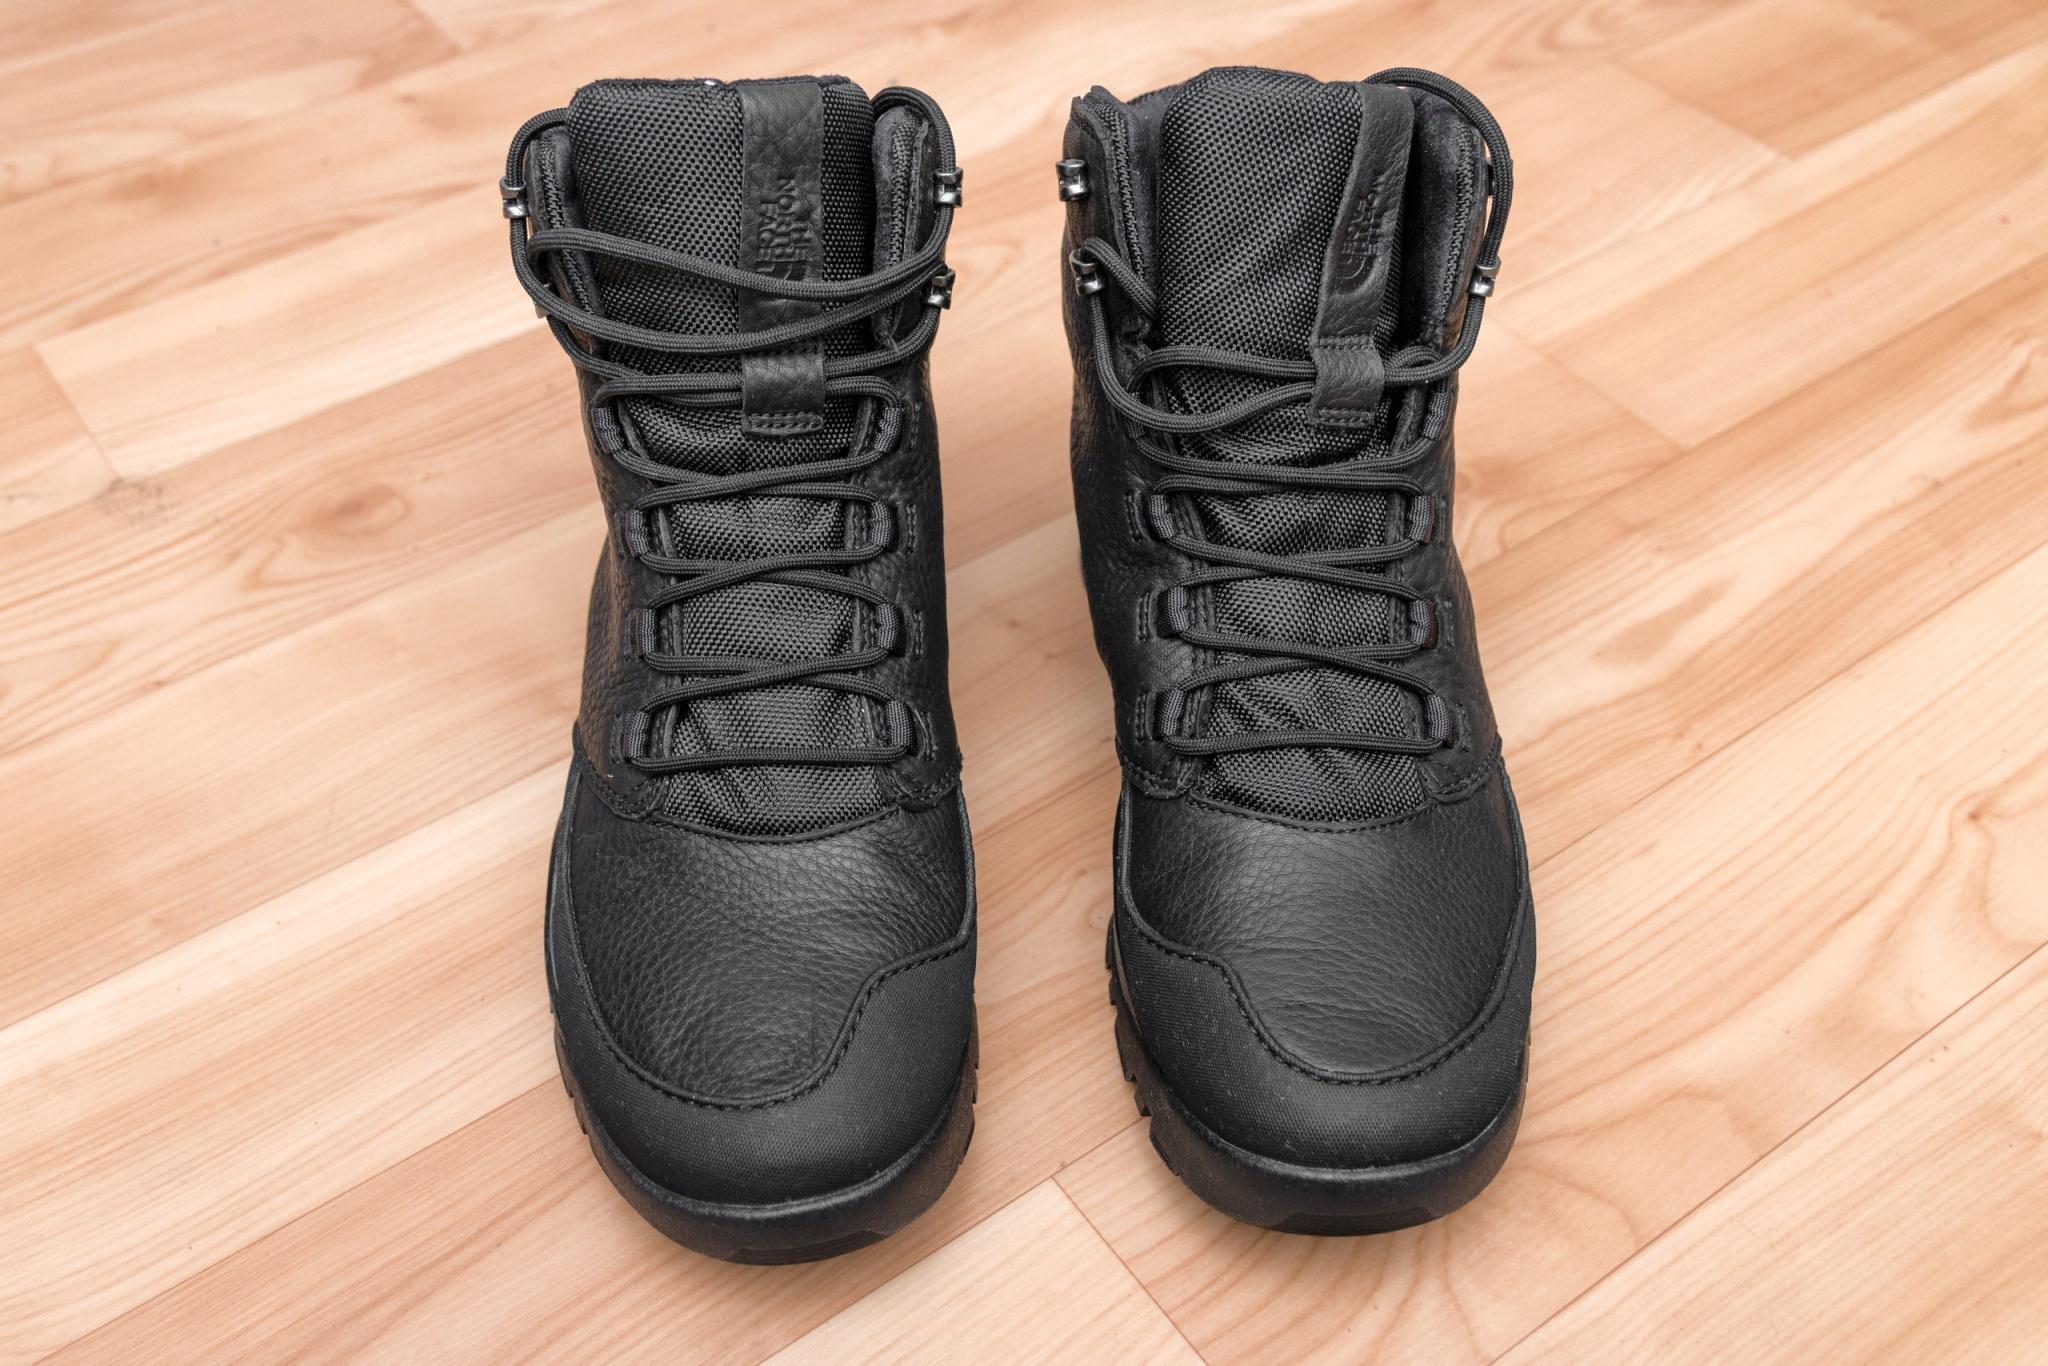 1b46901f6a52 Обзор на Ботинки THE NORTH FACE T93316ZU5 для мужчины, цвет черный, размер  12 -